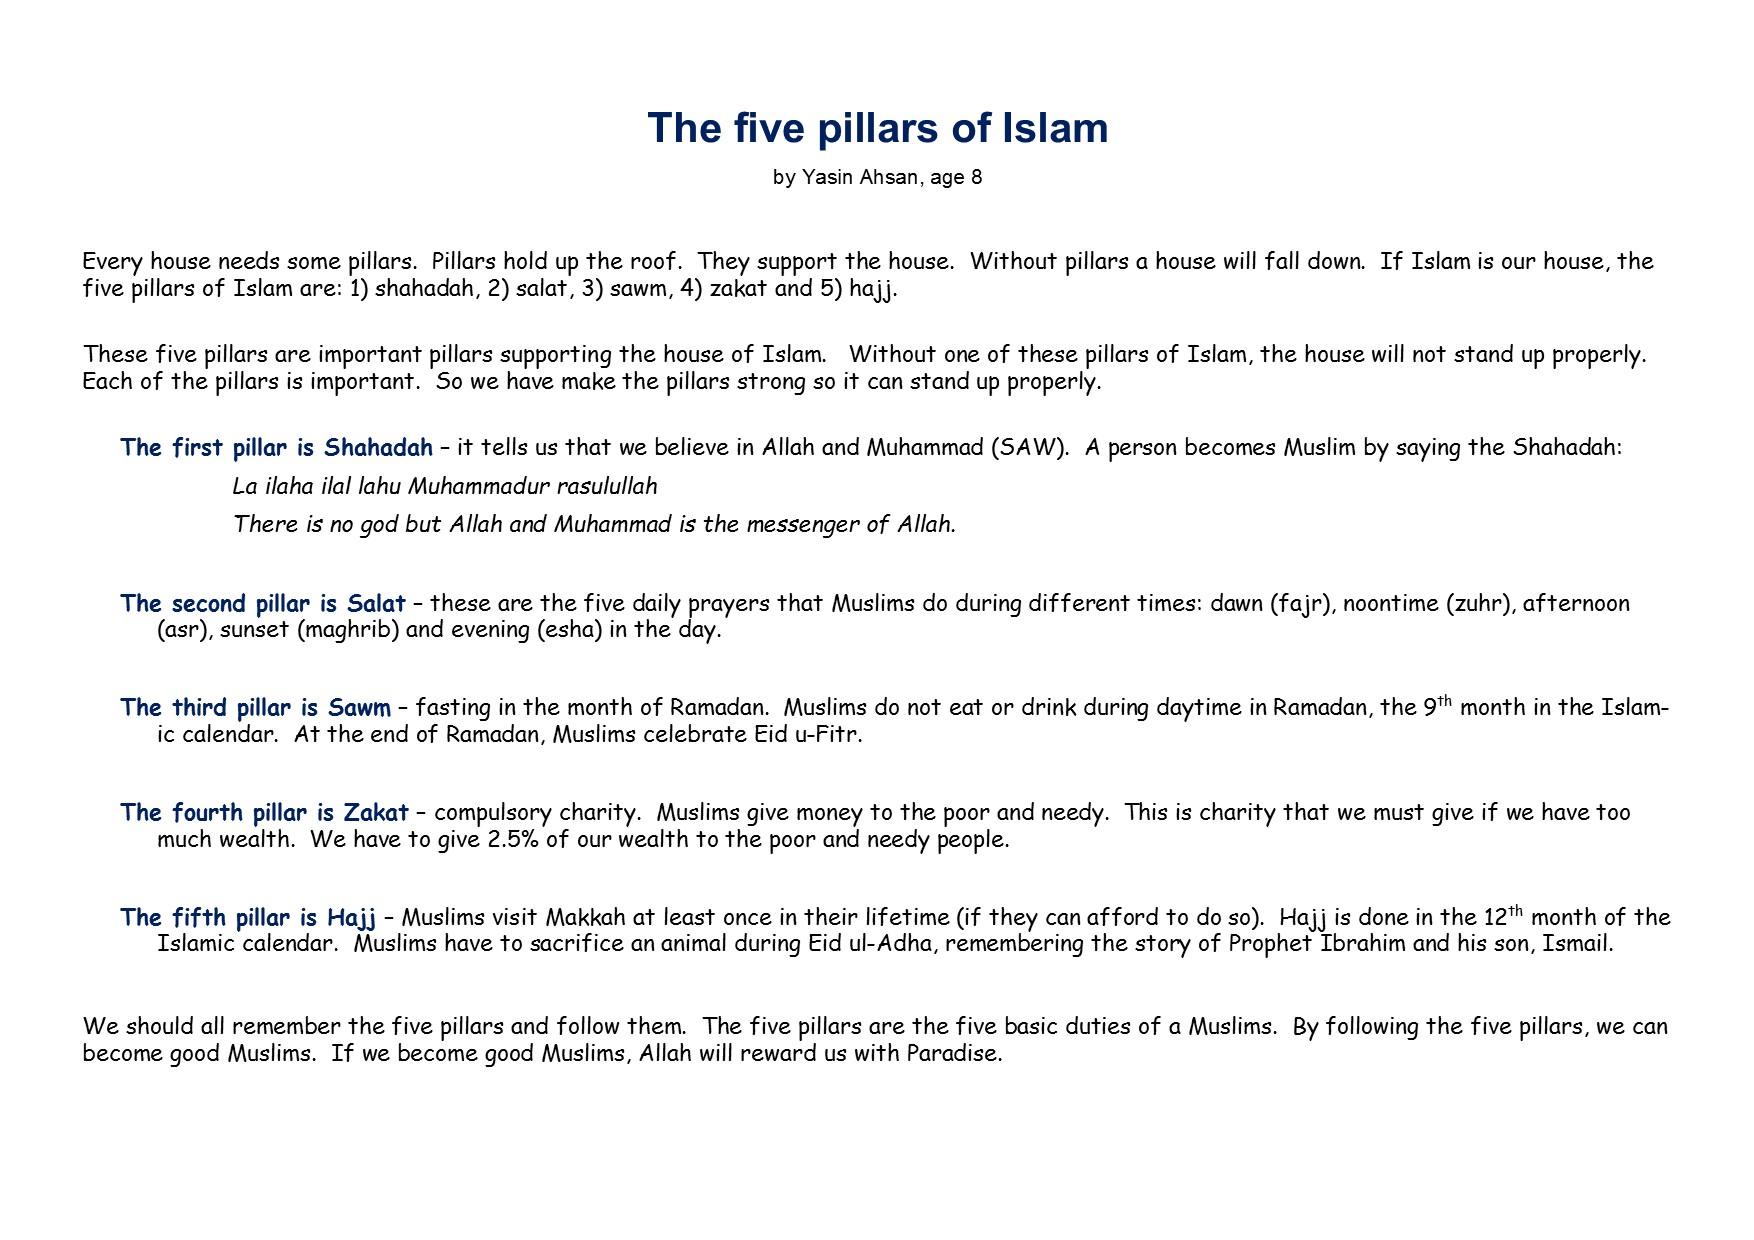 Worksheets Five Pillars Of Islam Worksheet Waytoohuman